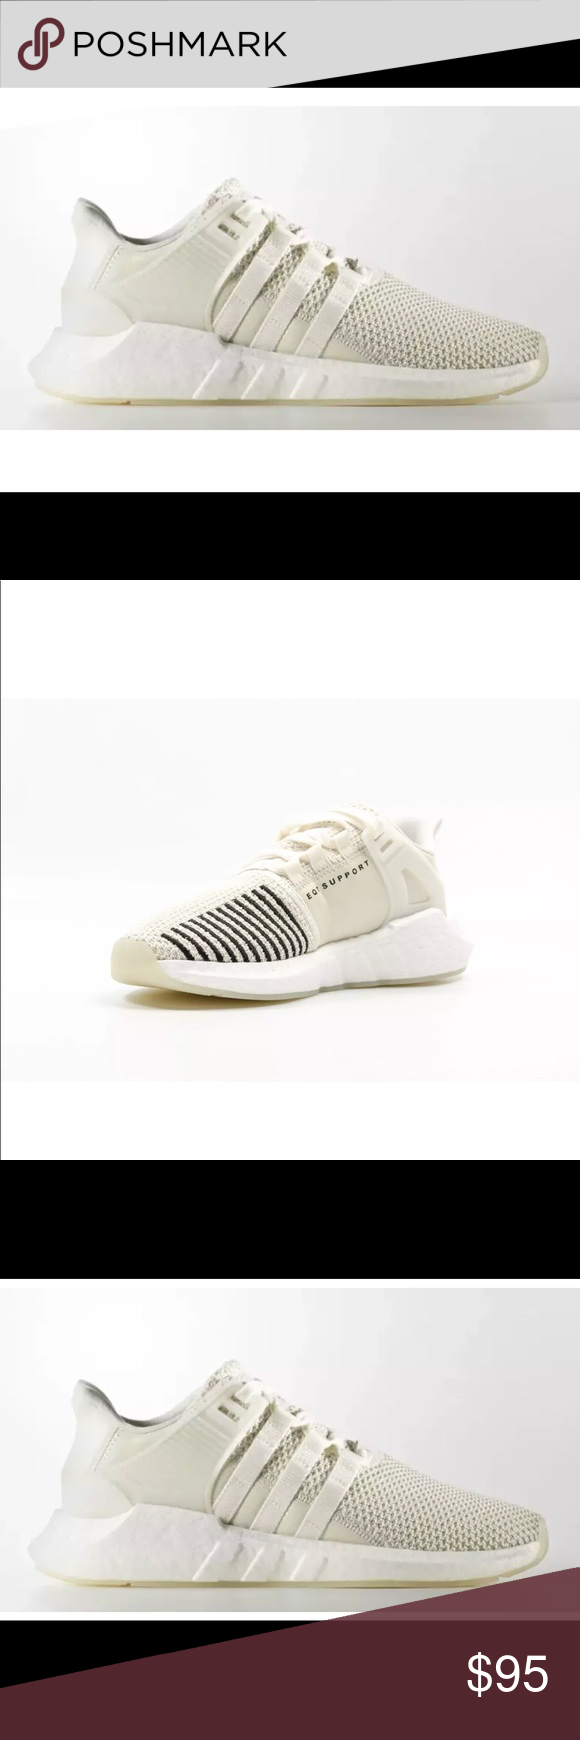 Adidas EQT Support SZ 8 crema NWT mi elegante armario Pinterest